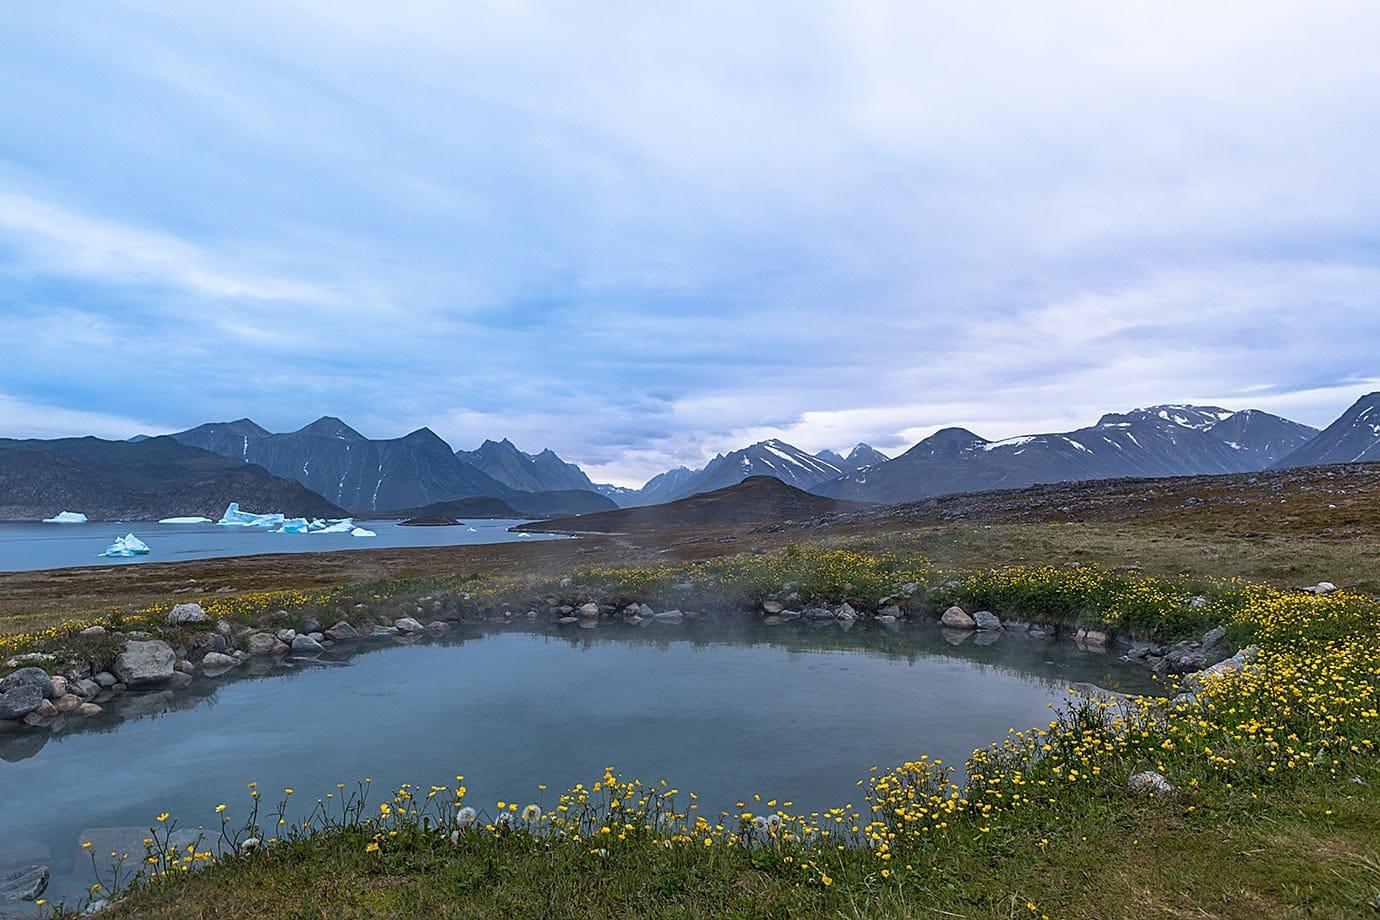 Hot springs in Qaqortoq, Greenland